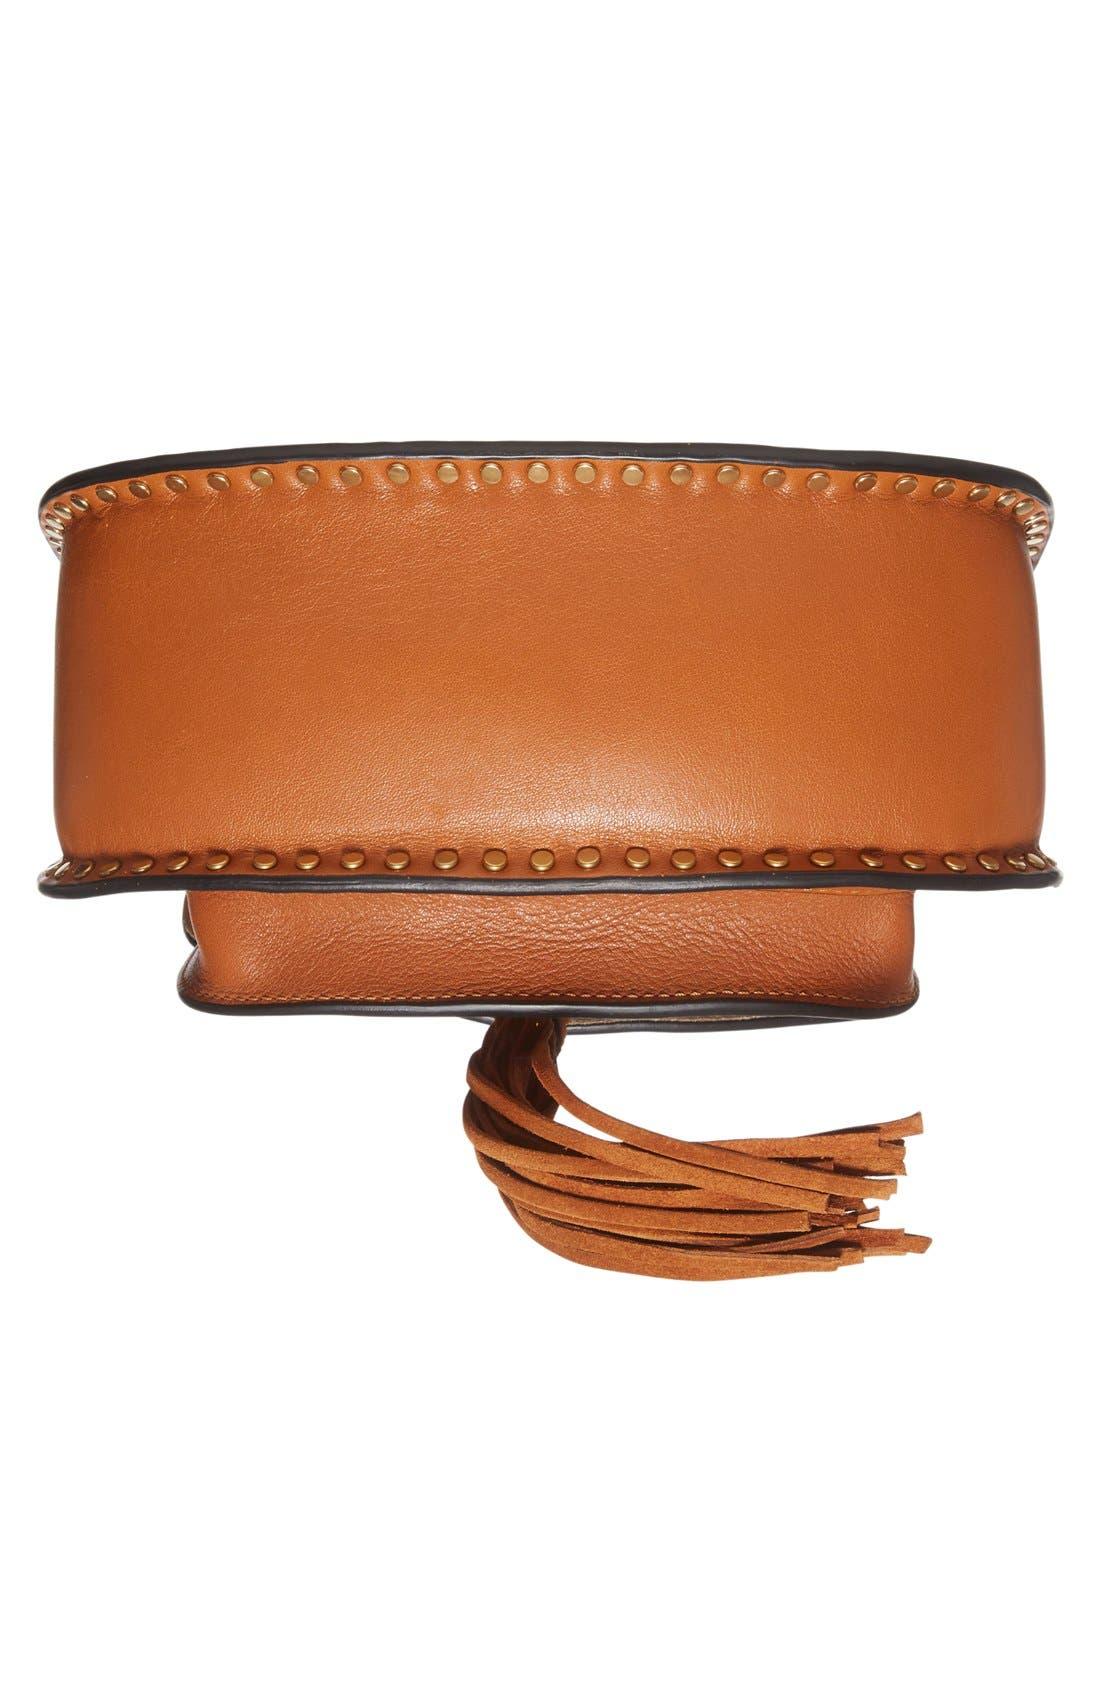 'Small Hudson' Studded Calfskin Leather Crossbody Bag,                             Alternate thumbnail 5, color,                             Caramel